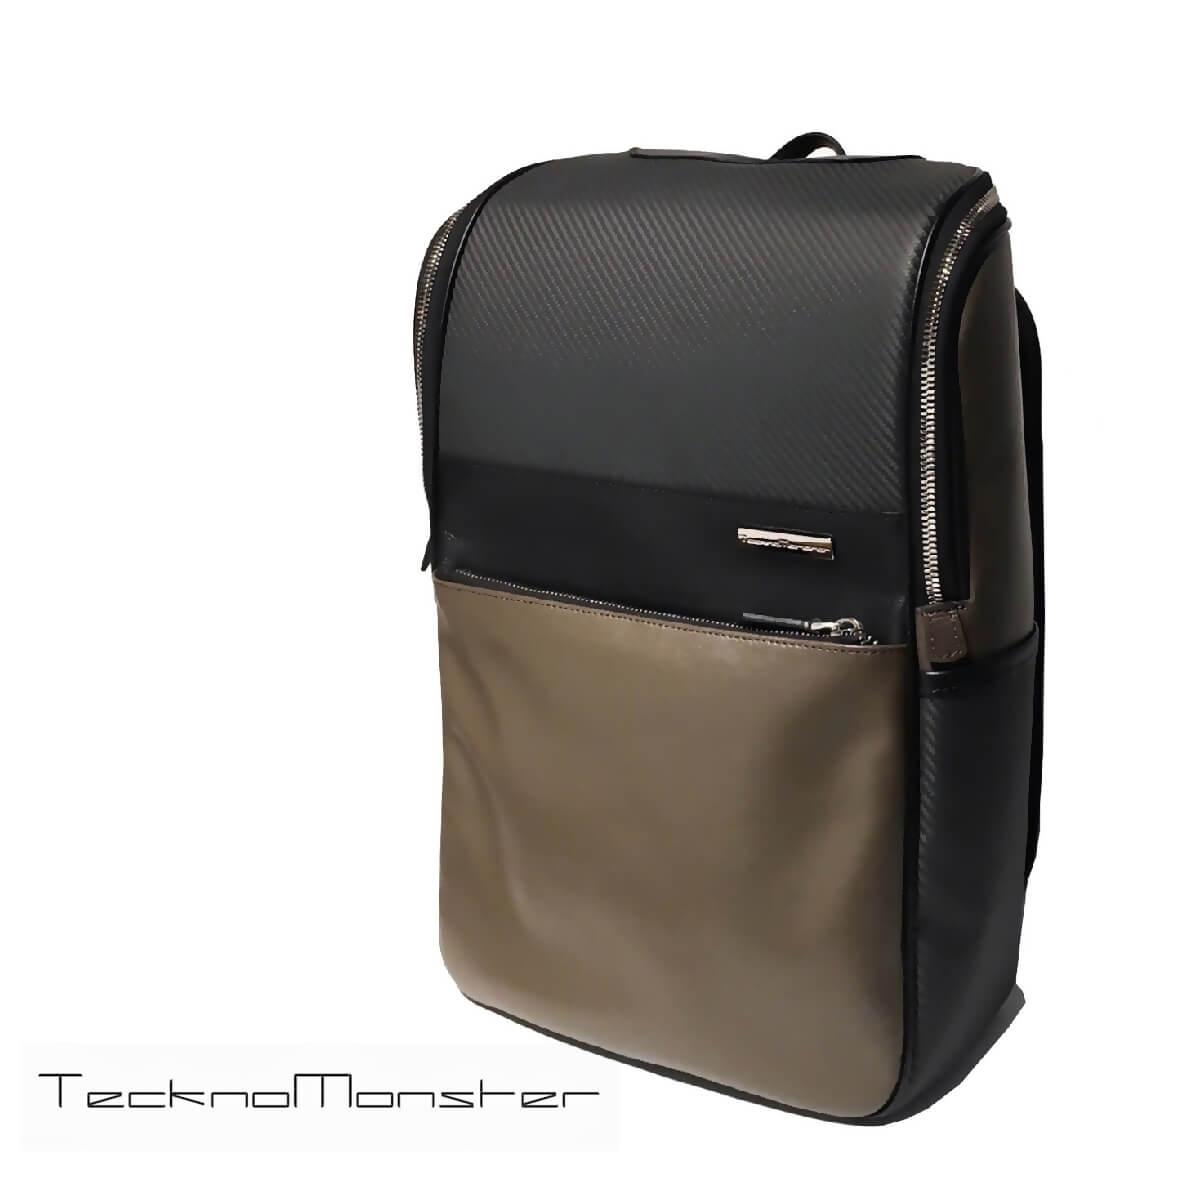 TecknoMonster (テクノモンスター)リュック バックパック メンズ レディース ブランド カーボンファイバー 軽量 モカブラウン